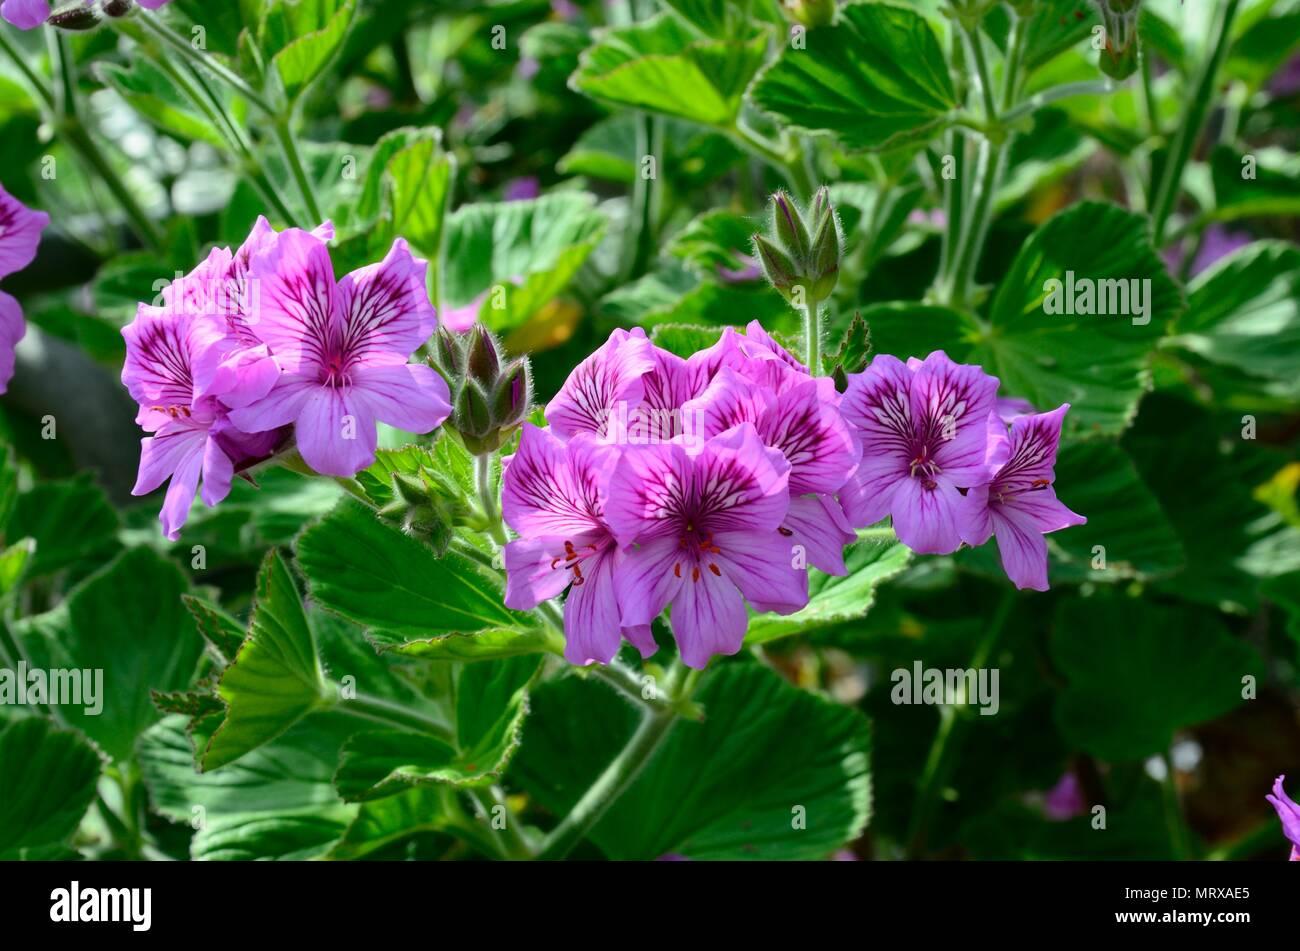 Pelargonium Cucullatum Fleurs Mauve Sauvage Banque D Images Photo